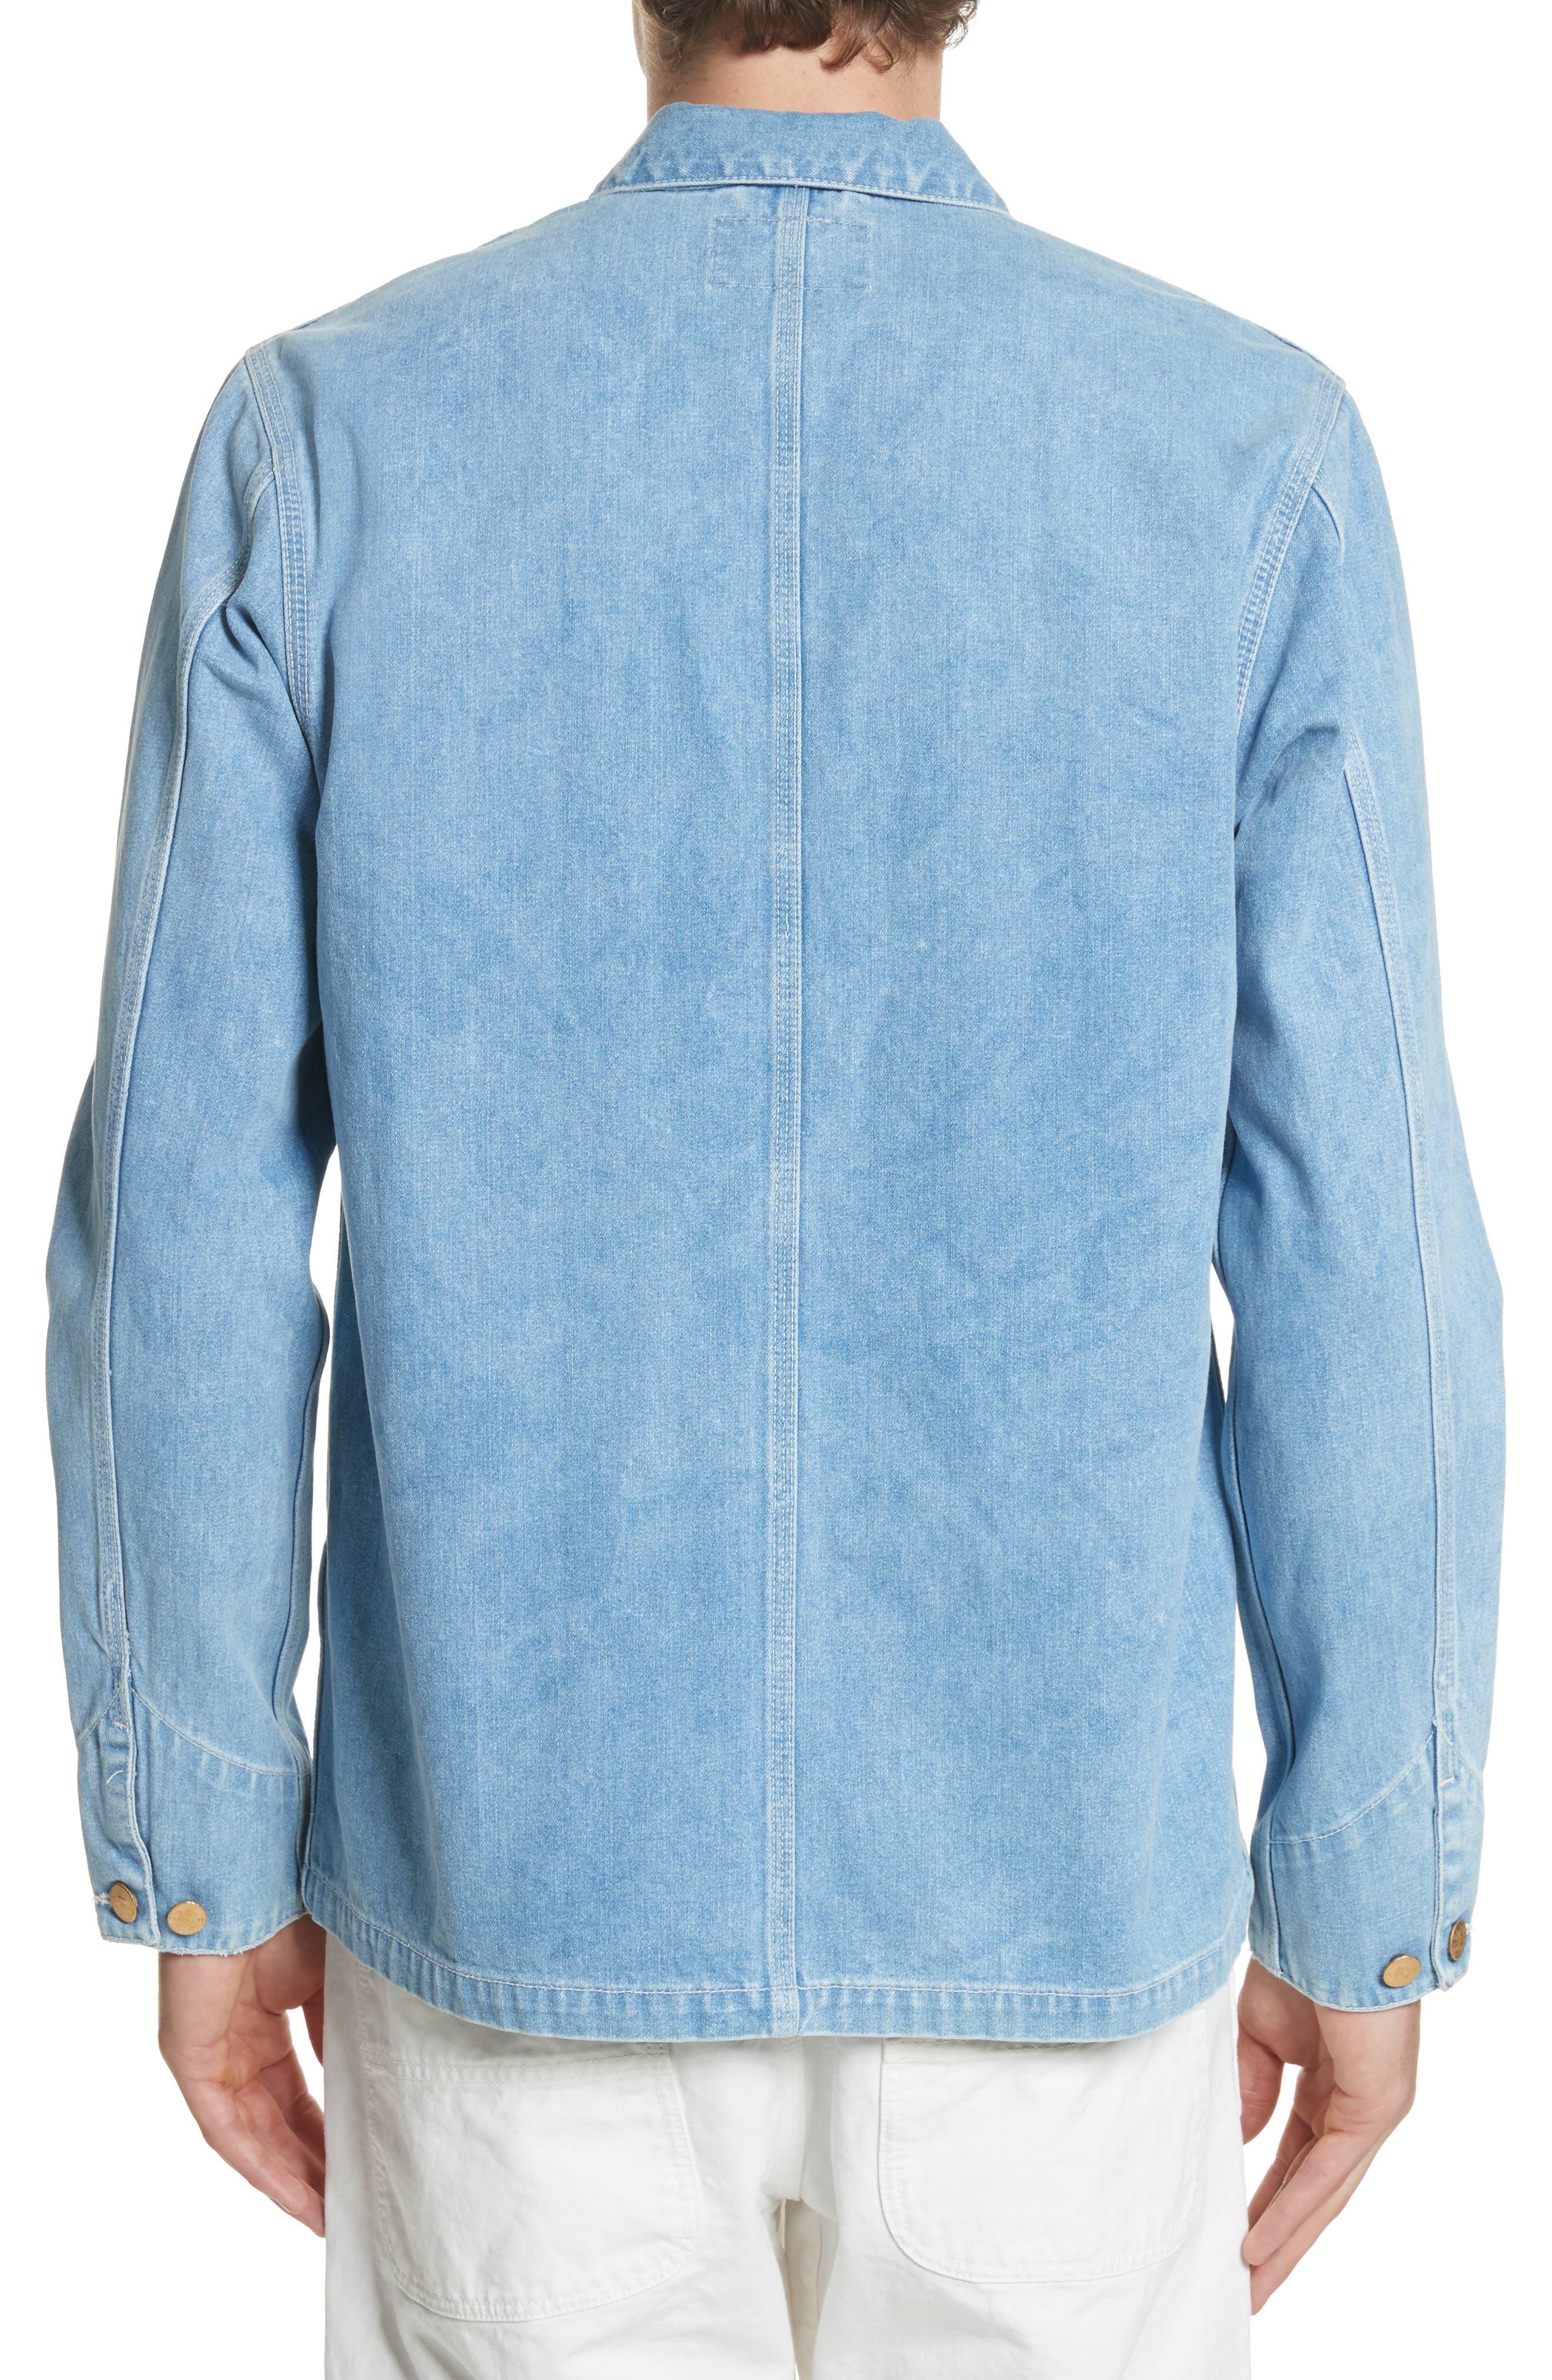 Michigan Norco Denim Chore Jacket,                             Alternate thumbnail 2, color,